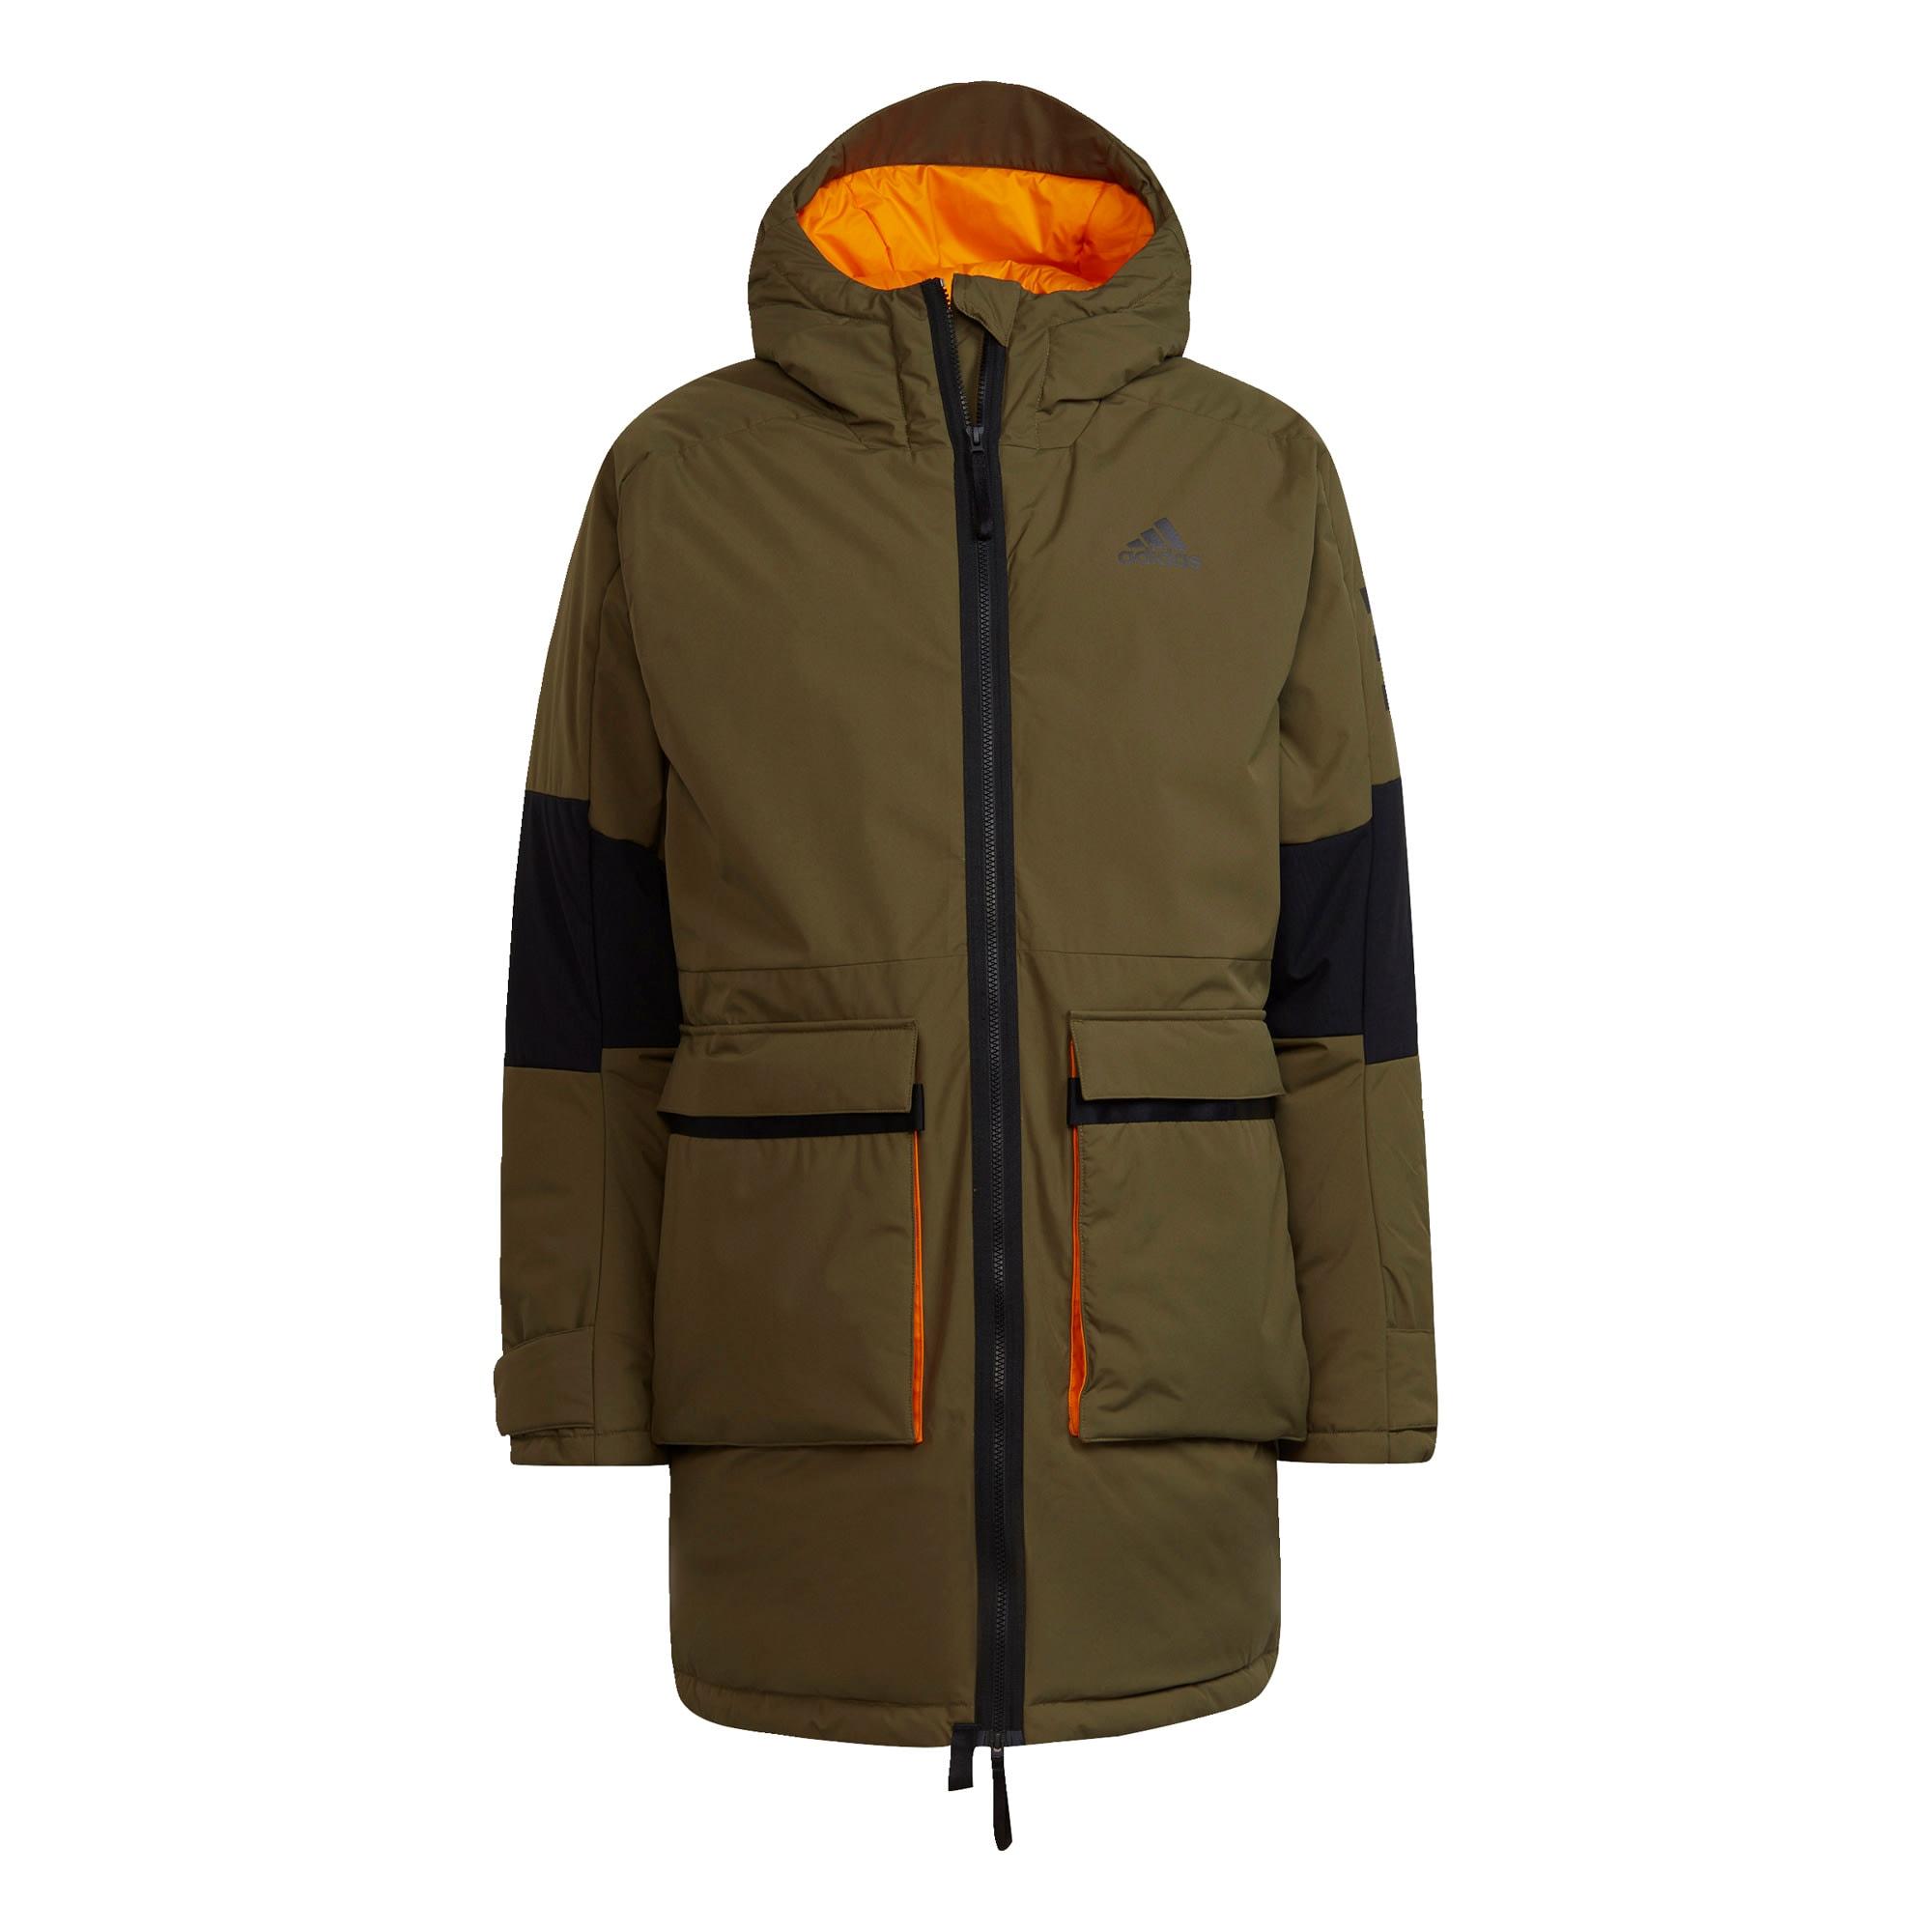 ADIDAS PERFORMANCE Outdoorová bunda 'Utilitas'  khaki / černá / oranžová